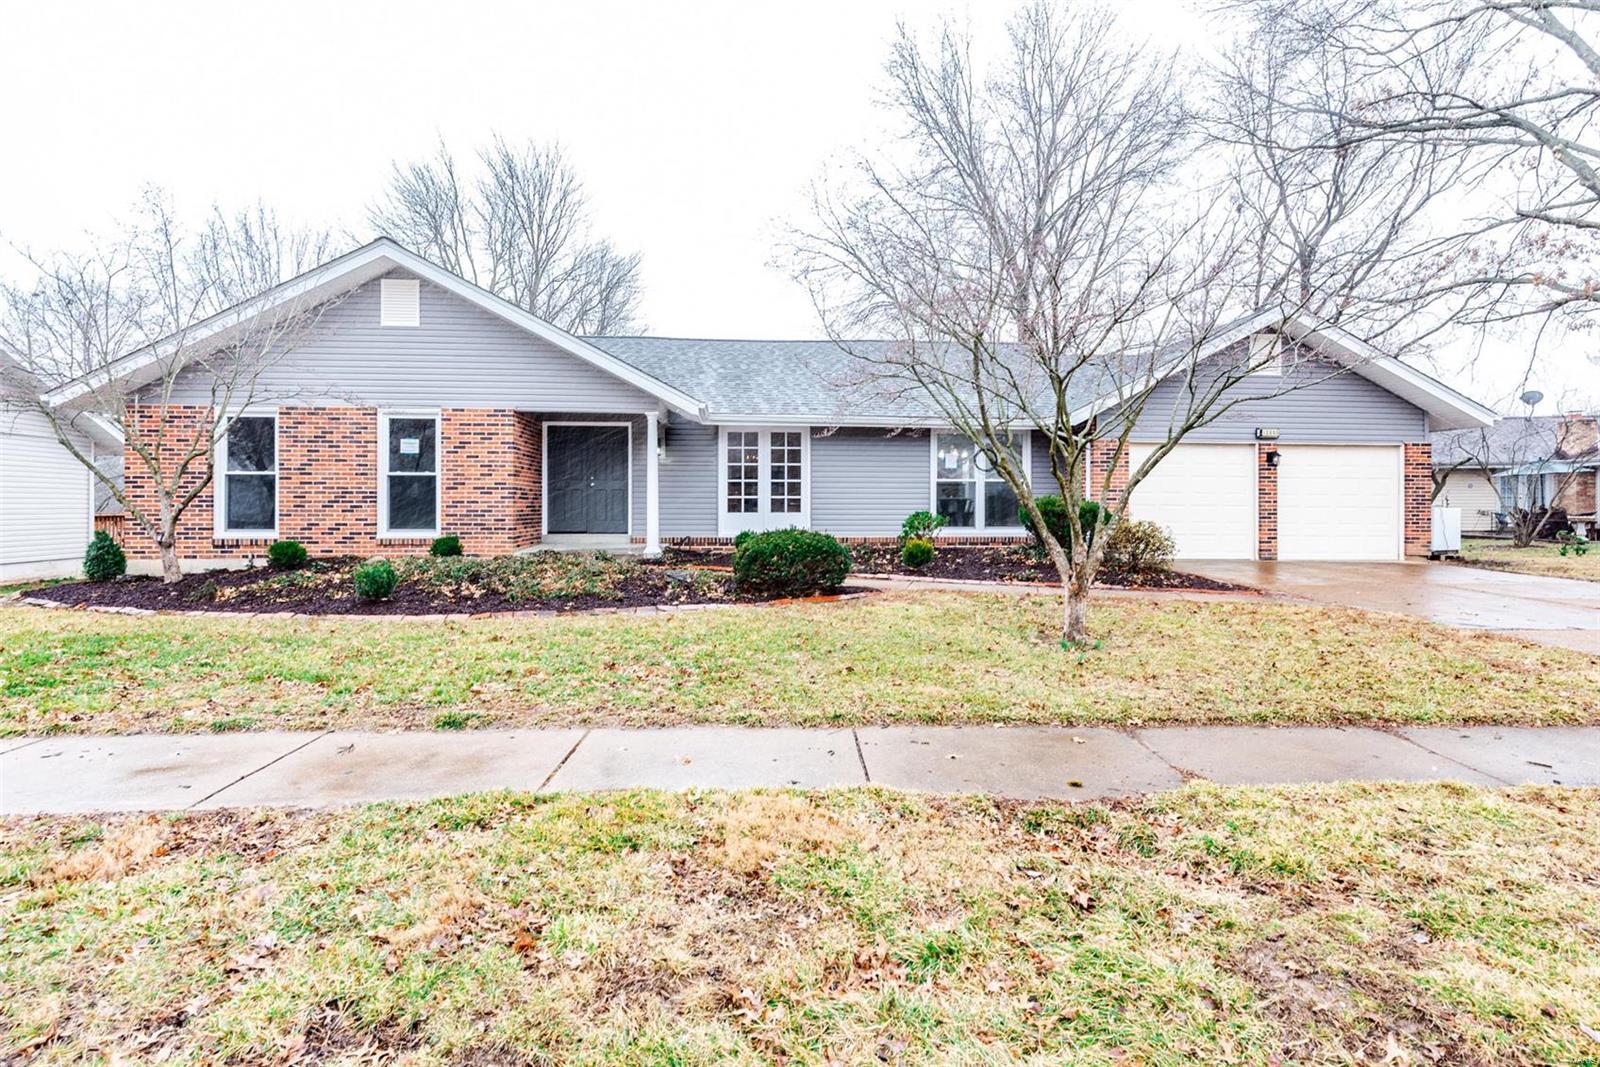 12880 Haverton Property Photo - Creve Coeur, MO real estate listing